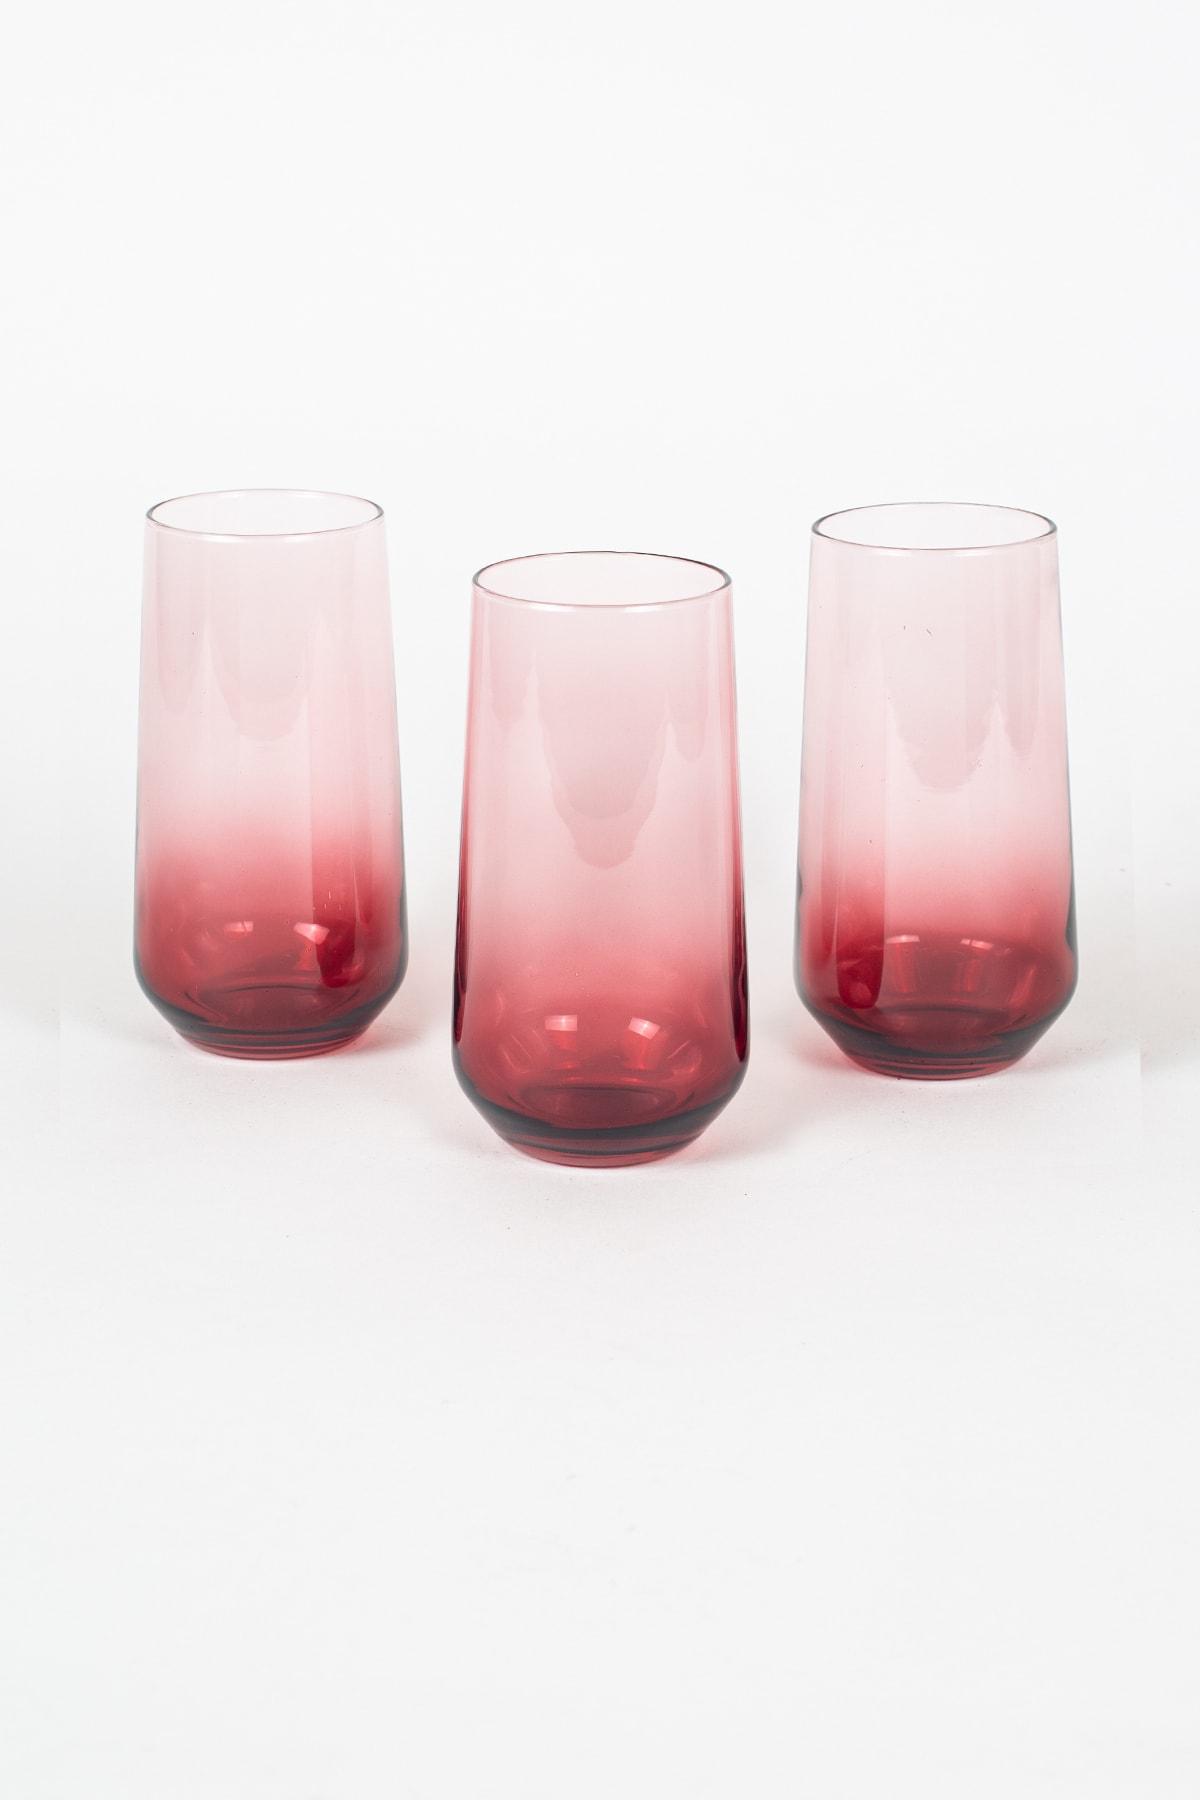 Rakle New Iconic 3'lü Meşrubat Bardağı Seti Kırmızı 470 1